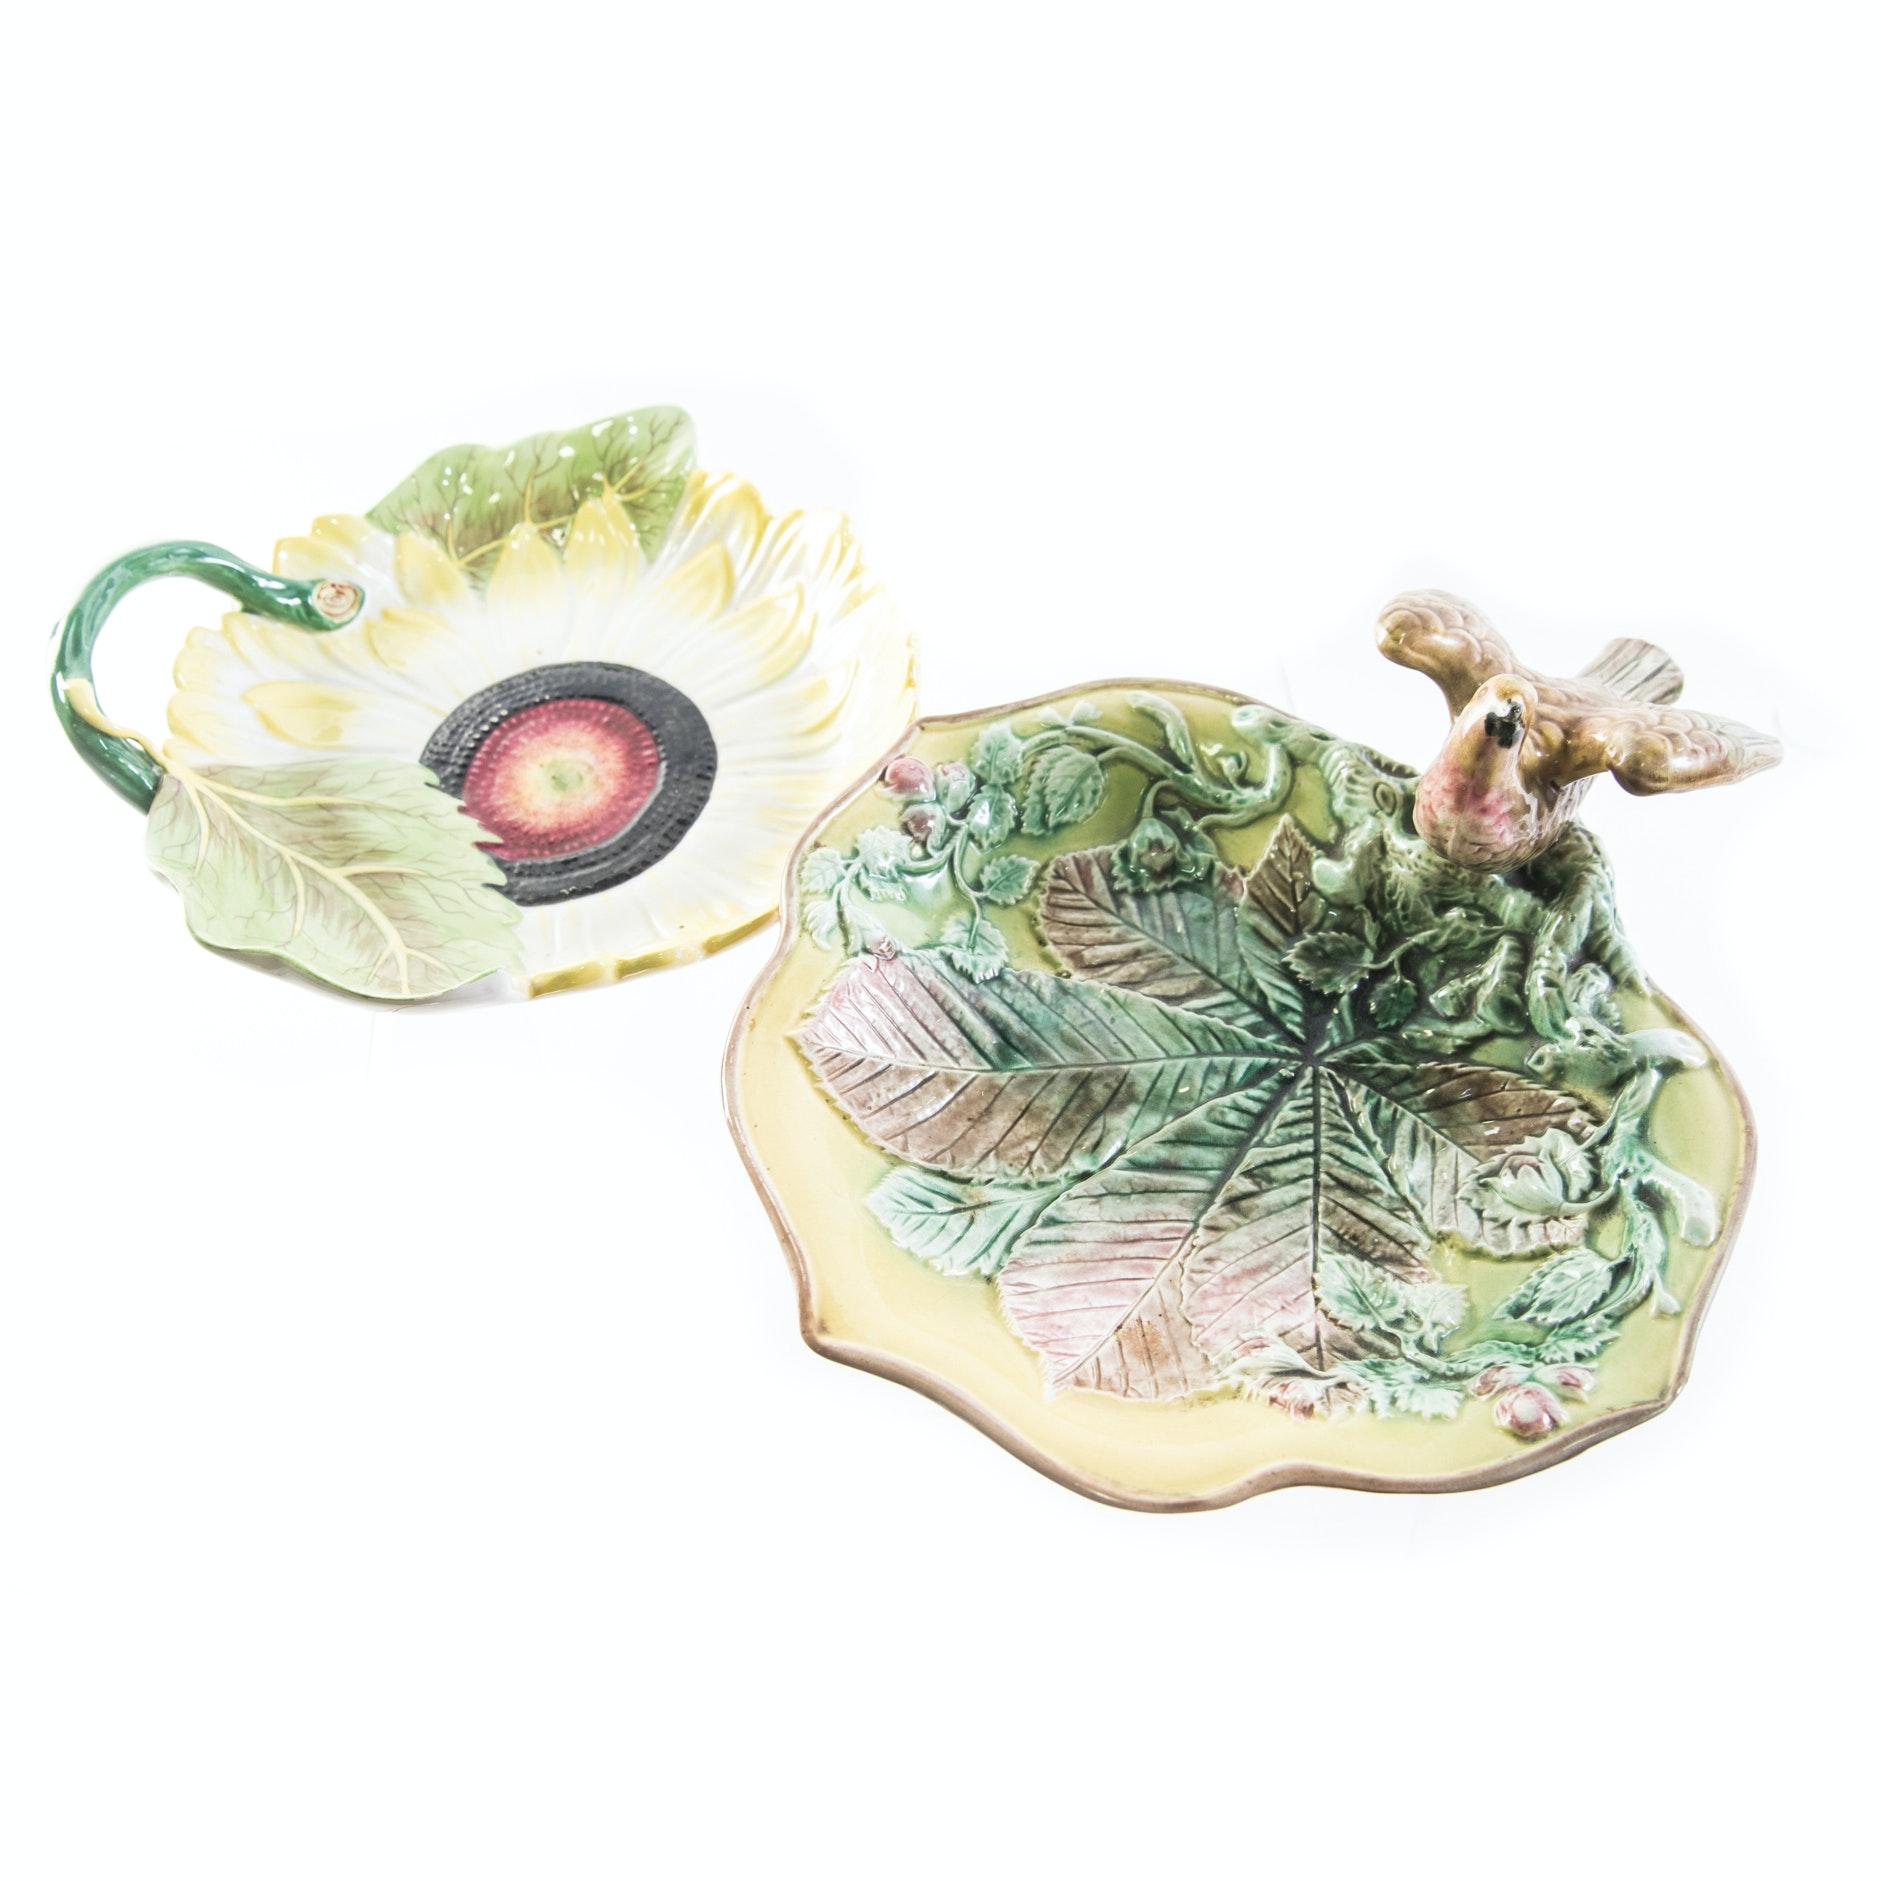 Decorative Ceramic Majolica Plates Featuring Mottahedeh